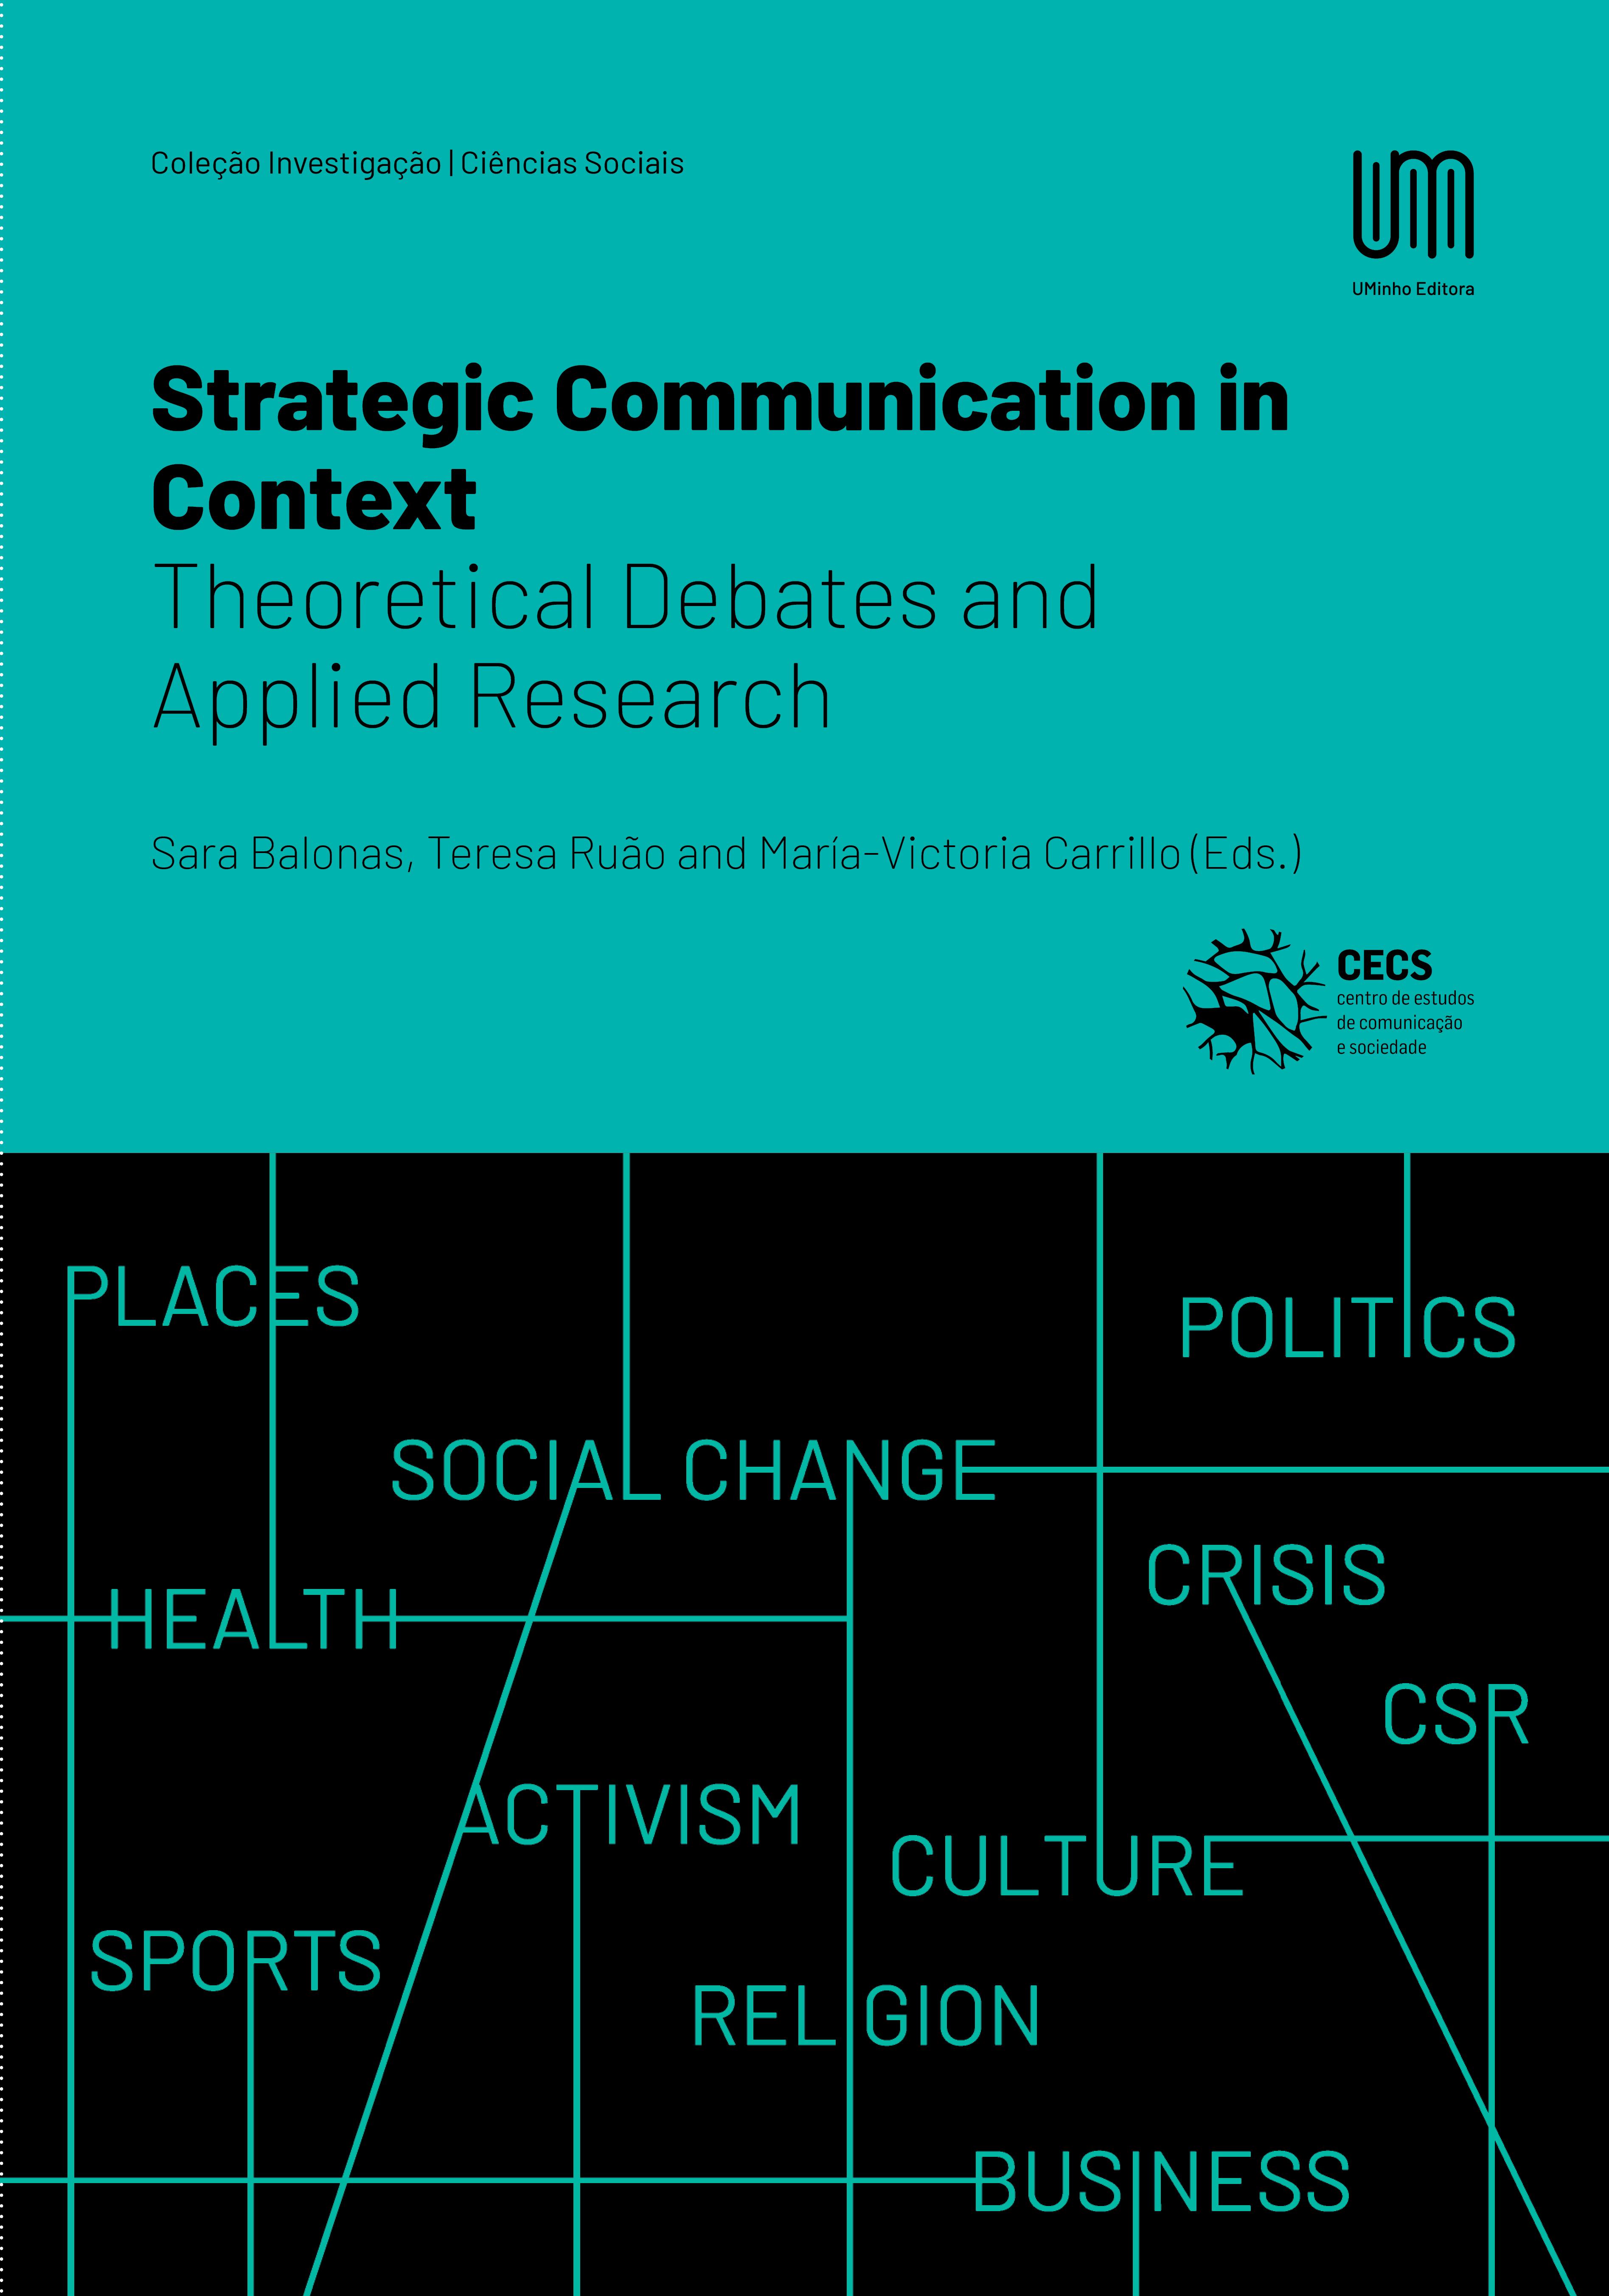 Nova publicação: Strategic Communication in Context: Theoretical Debates and Applied Research